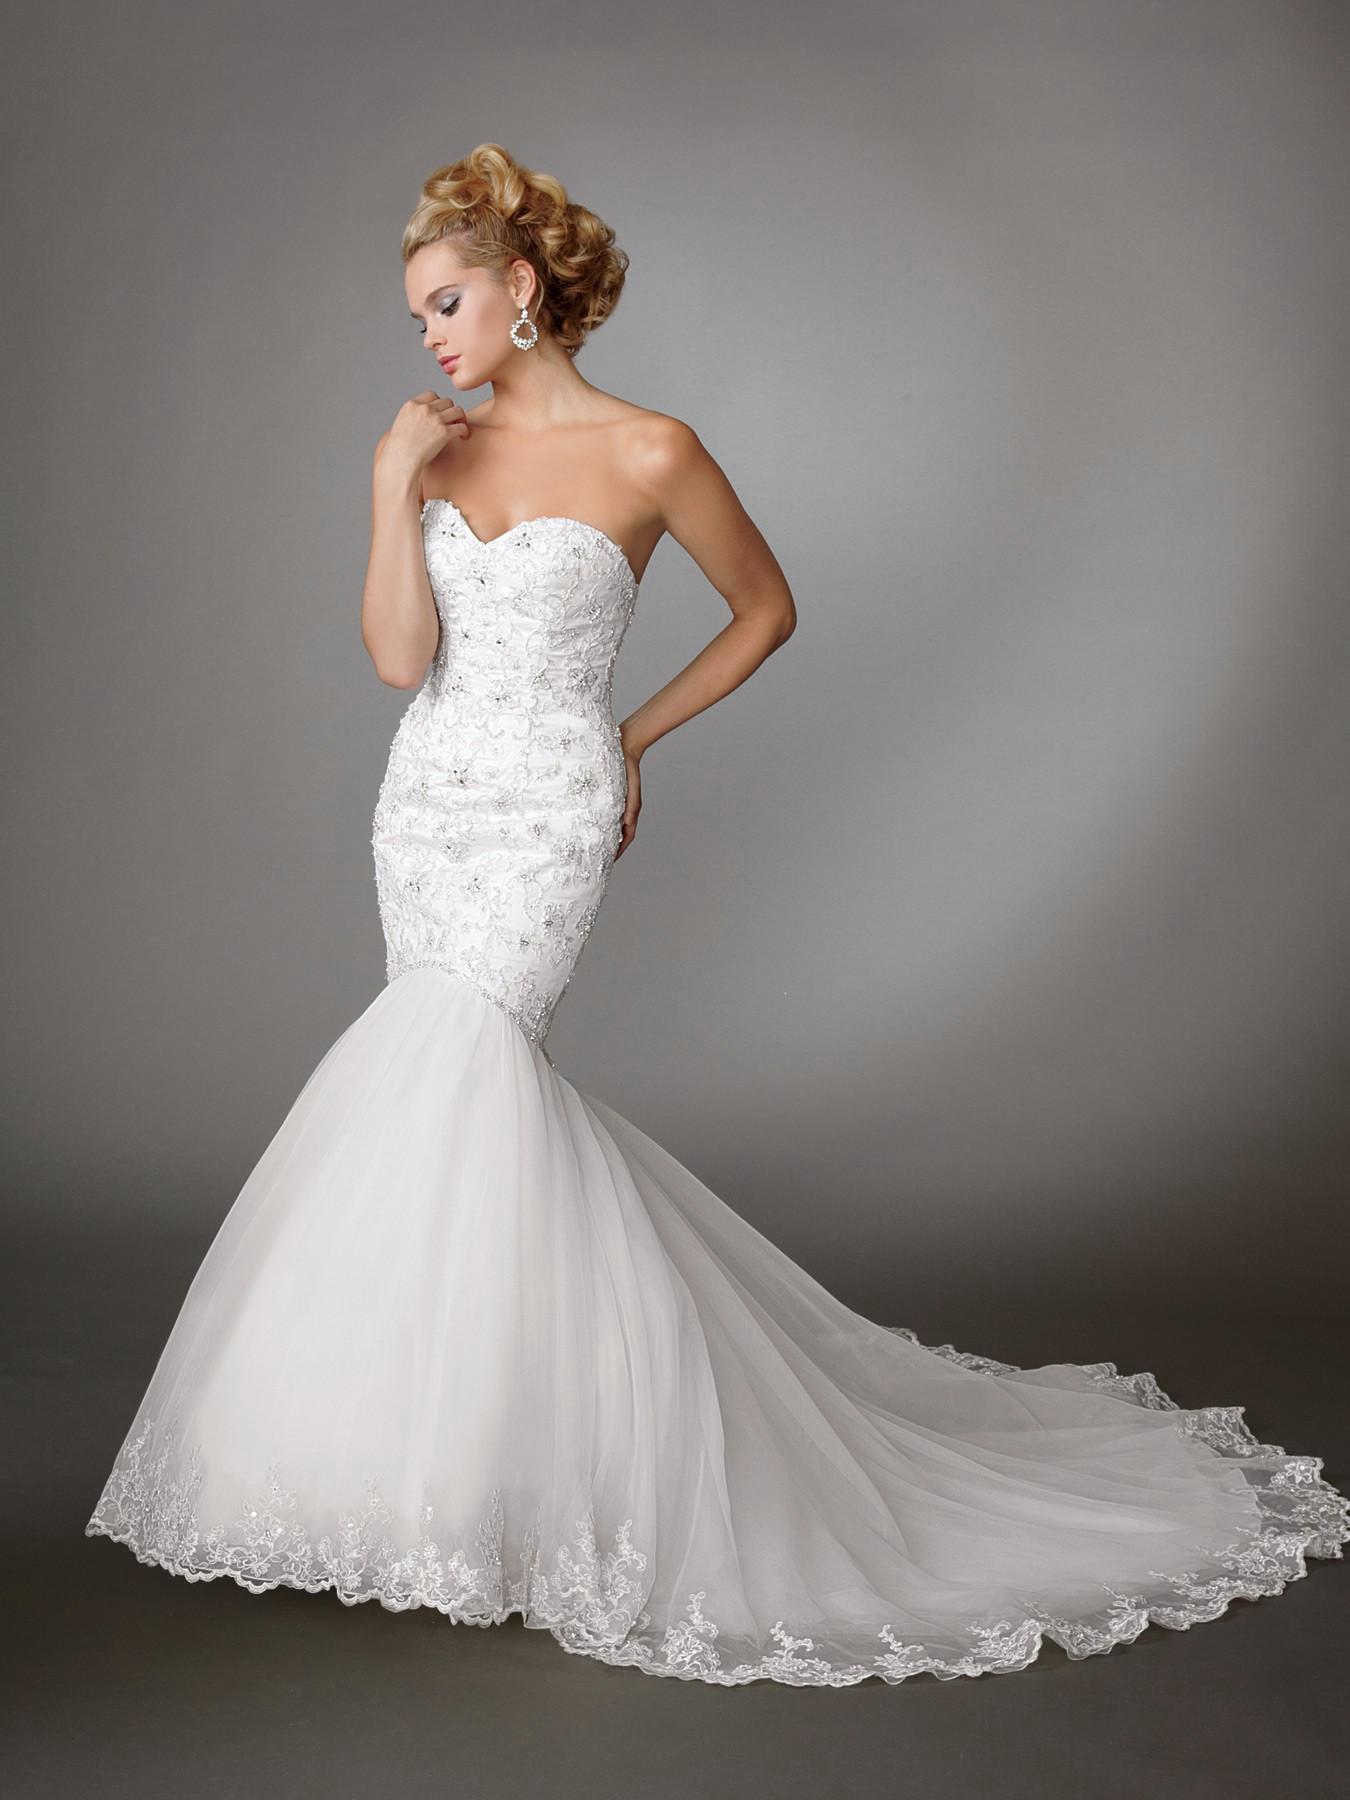 wedding dresses mermaid style photo - 1